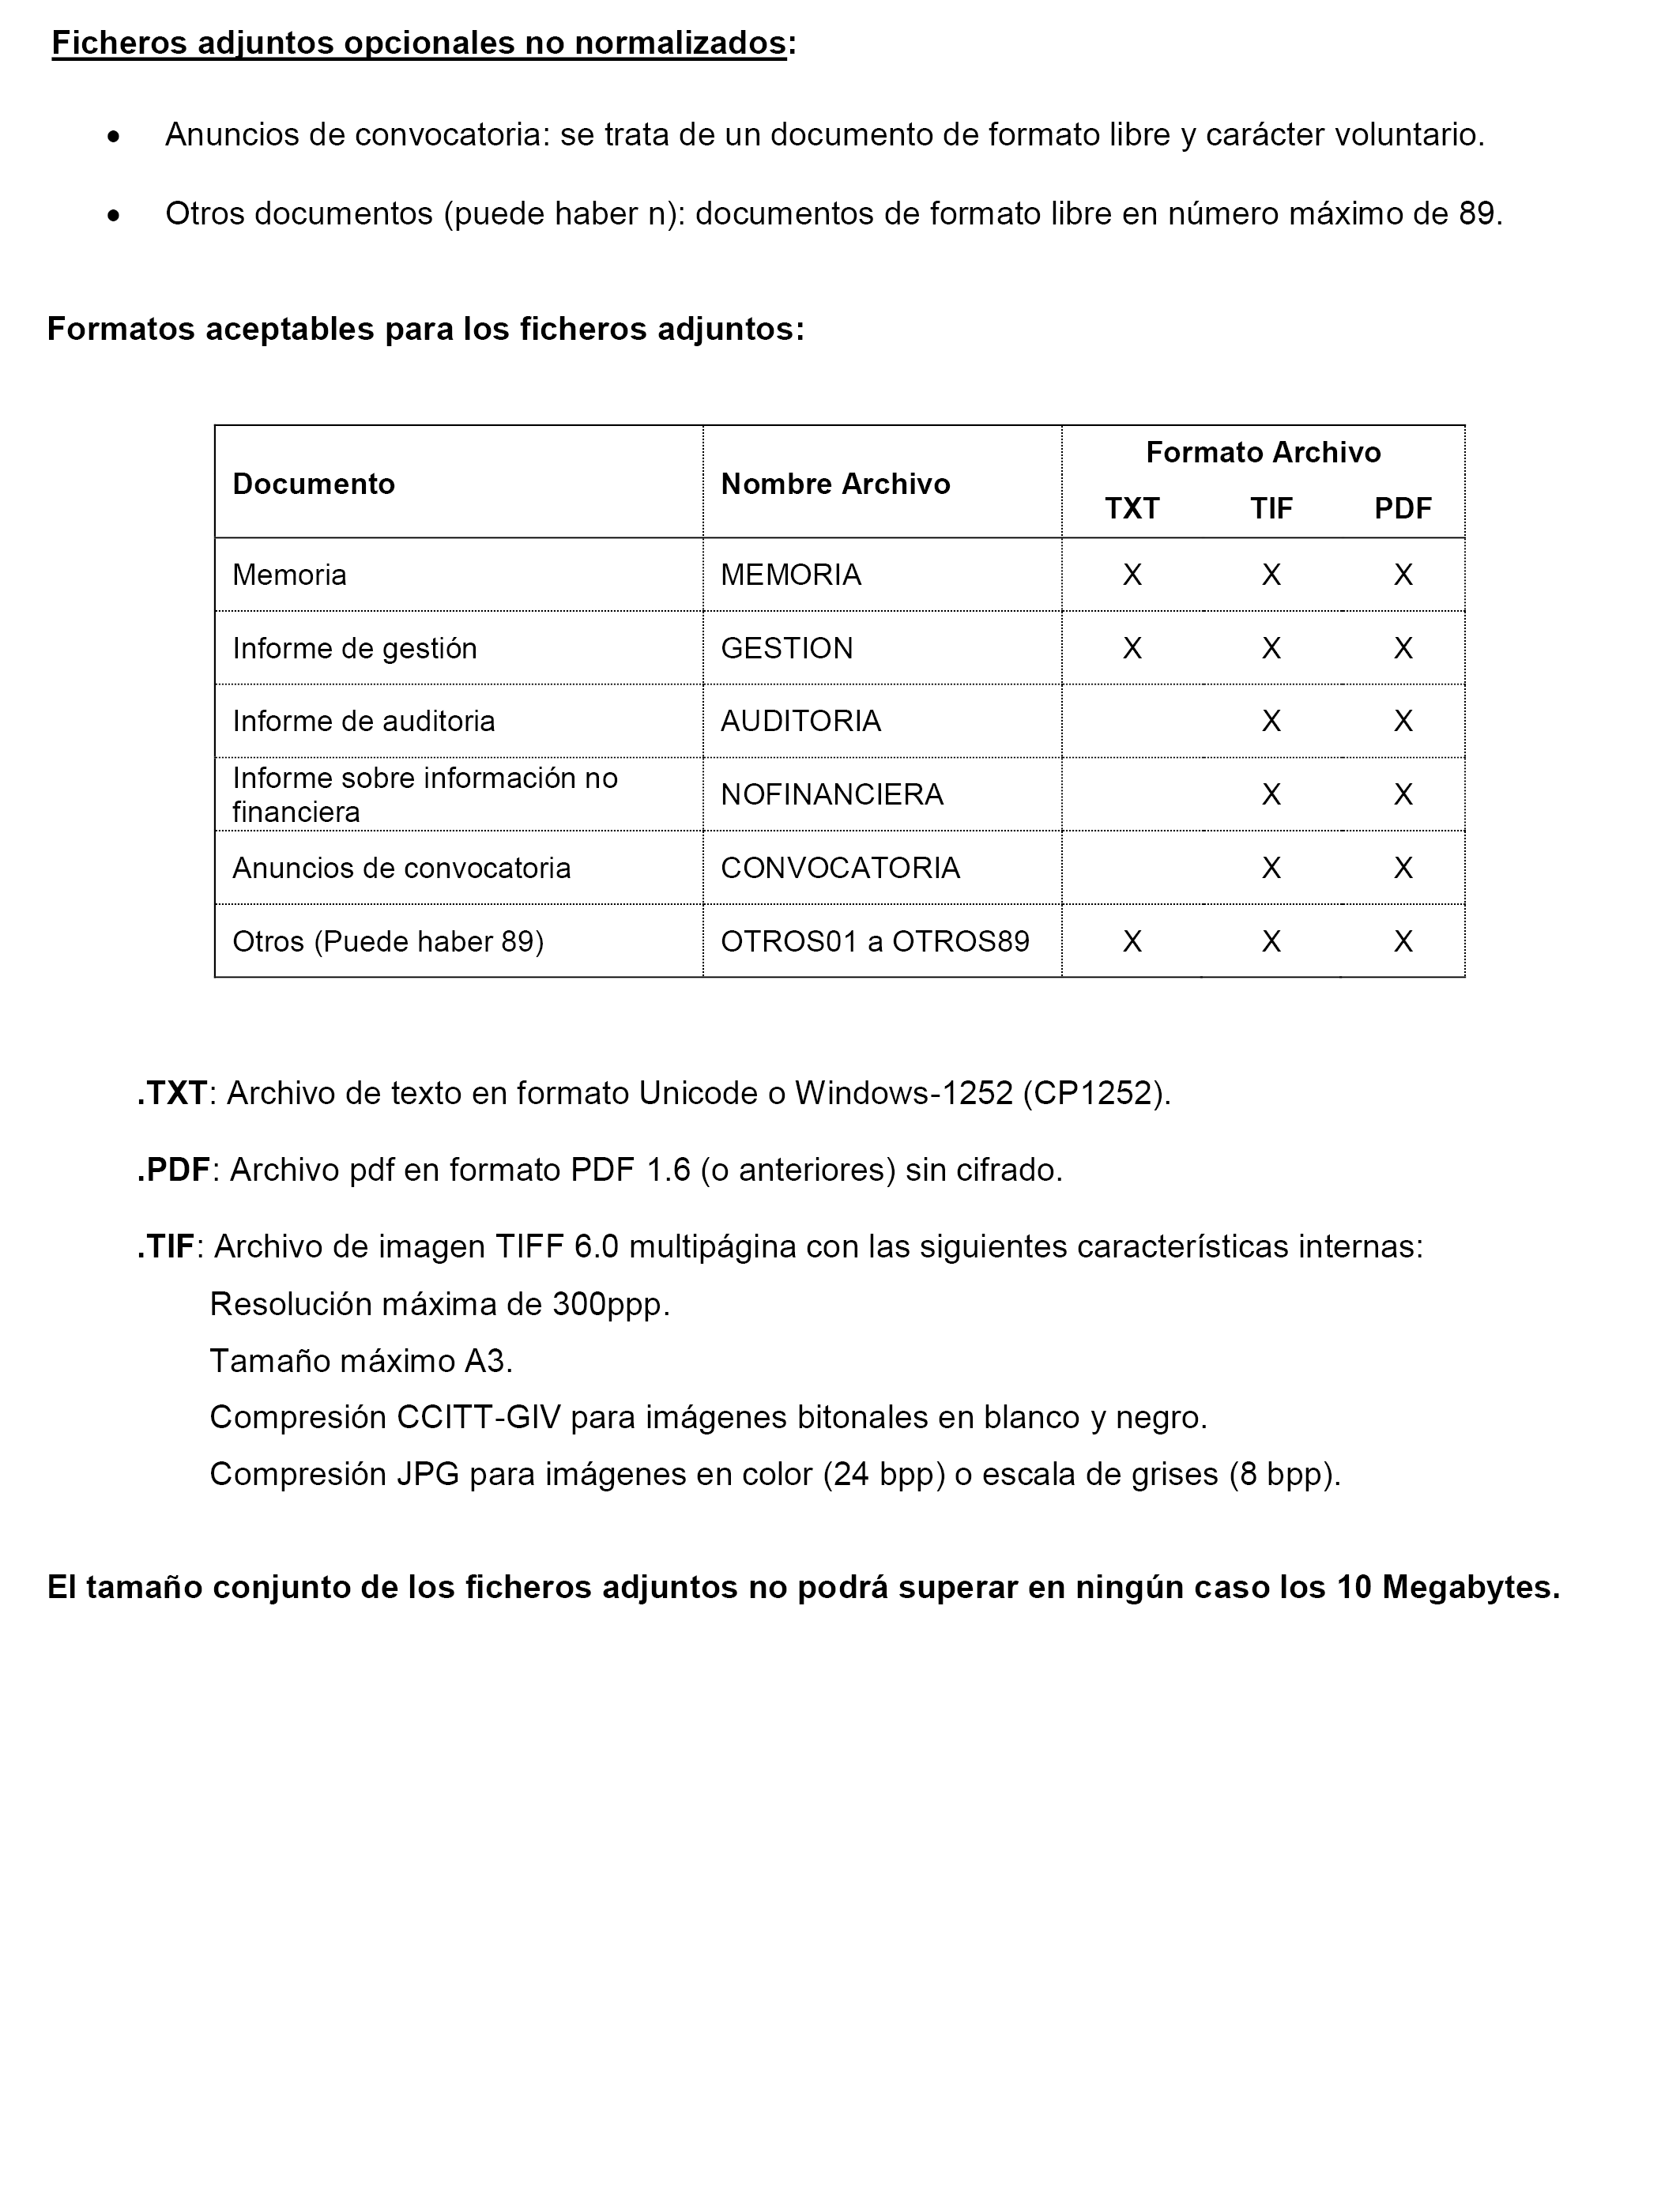 BOE.es - Documento BOE-A-2018-4242